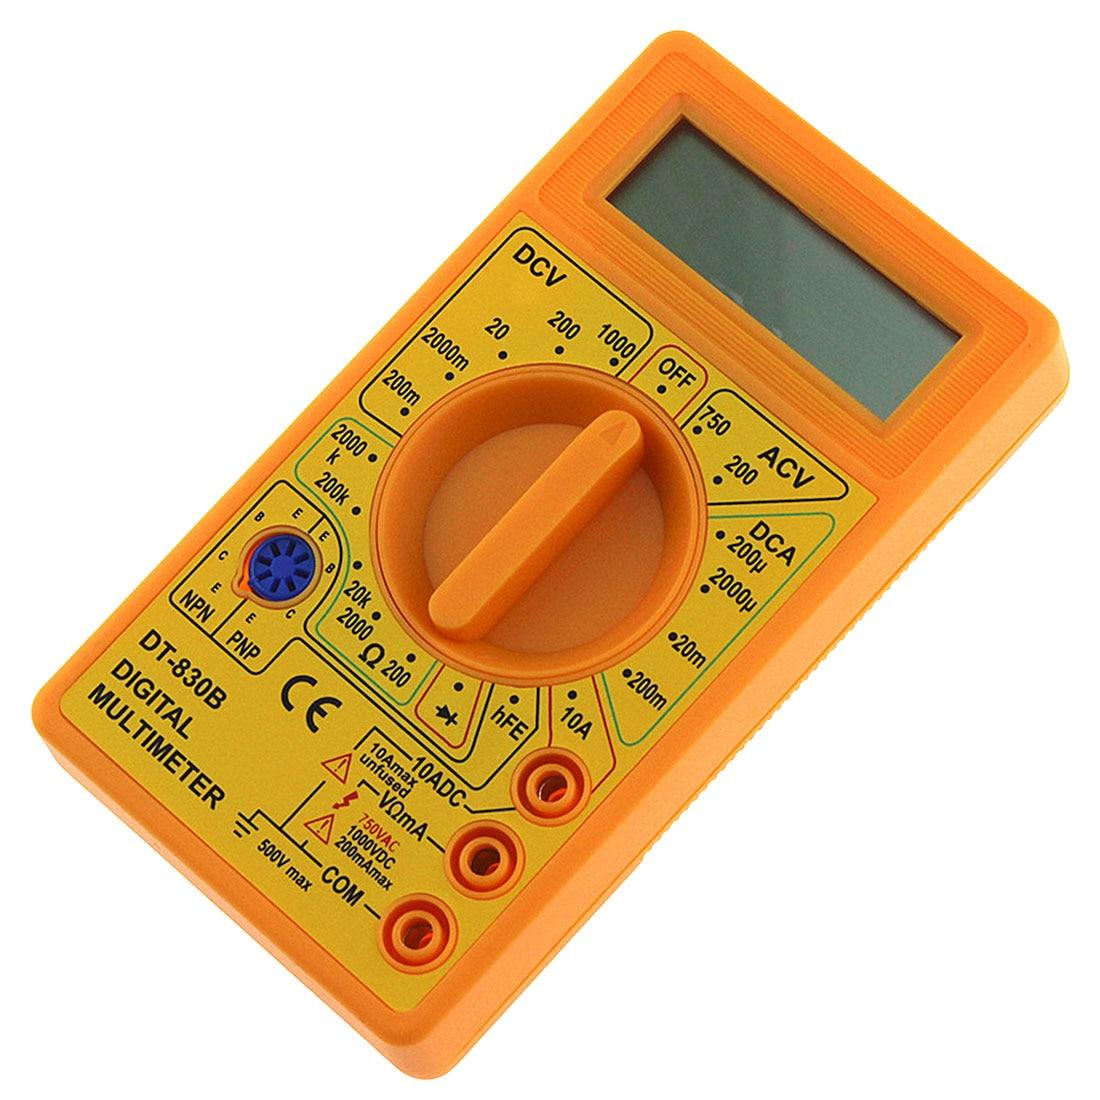 AC/CC 750/1000V LCD Digital multímetro Mini multímetro sonda para voltímetro amperímetro ohmios medidor probador